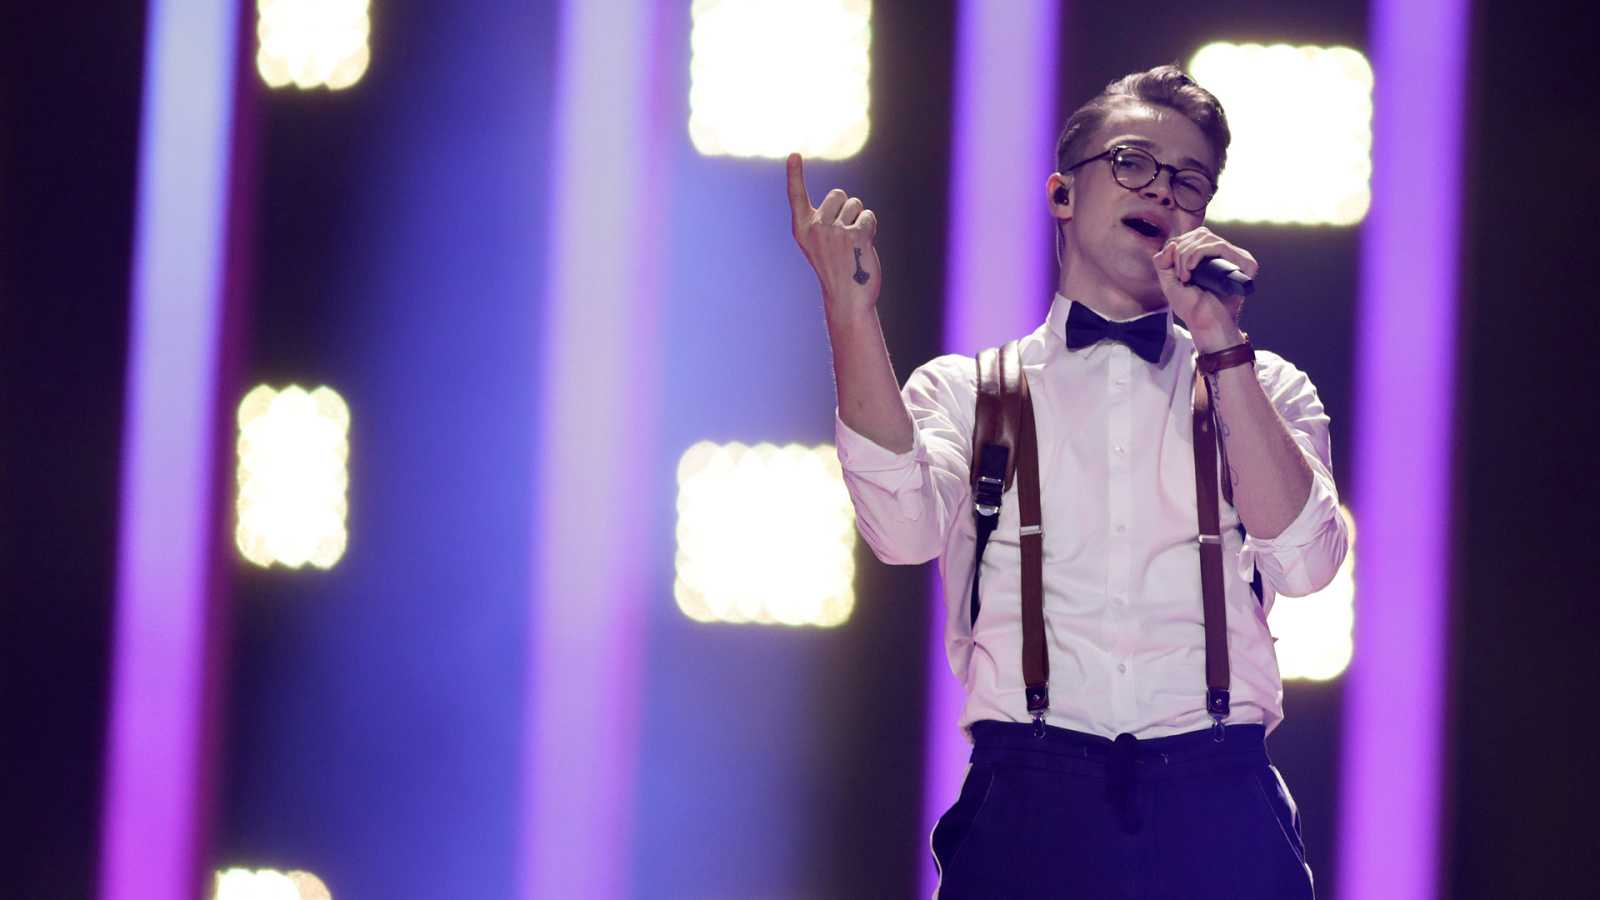 "Eurovisión - República Checa: Mikolas Josef canta ""Lie to me"" en la primera semifinal de Eurovisión 2018"